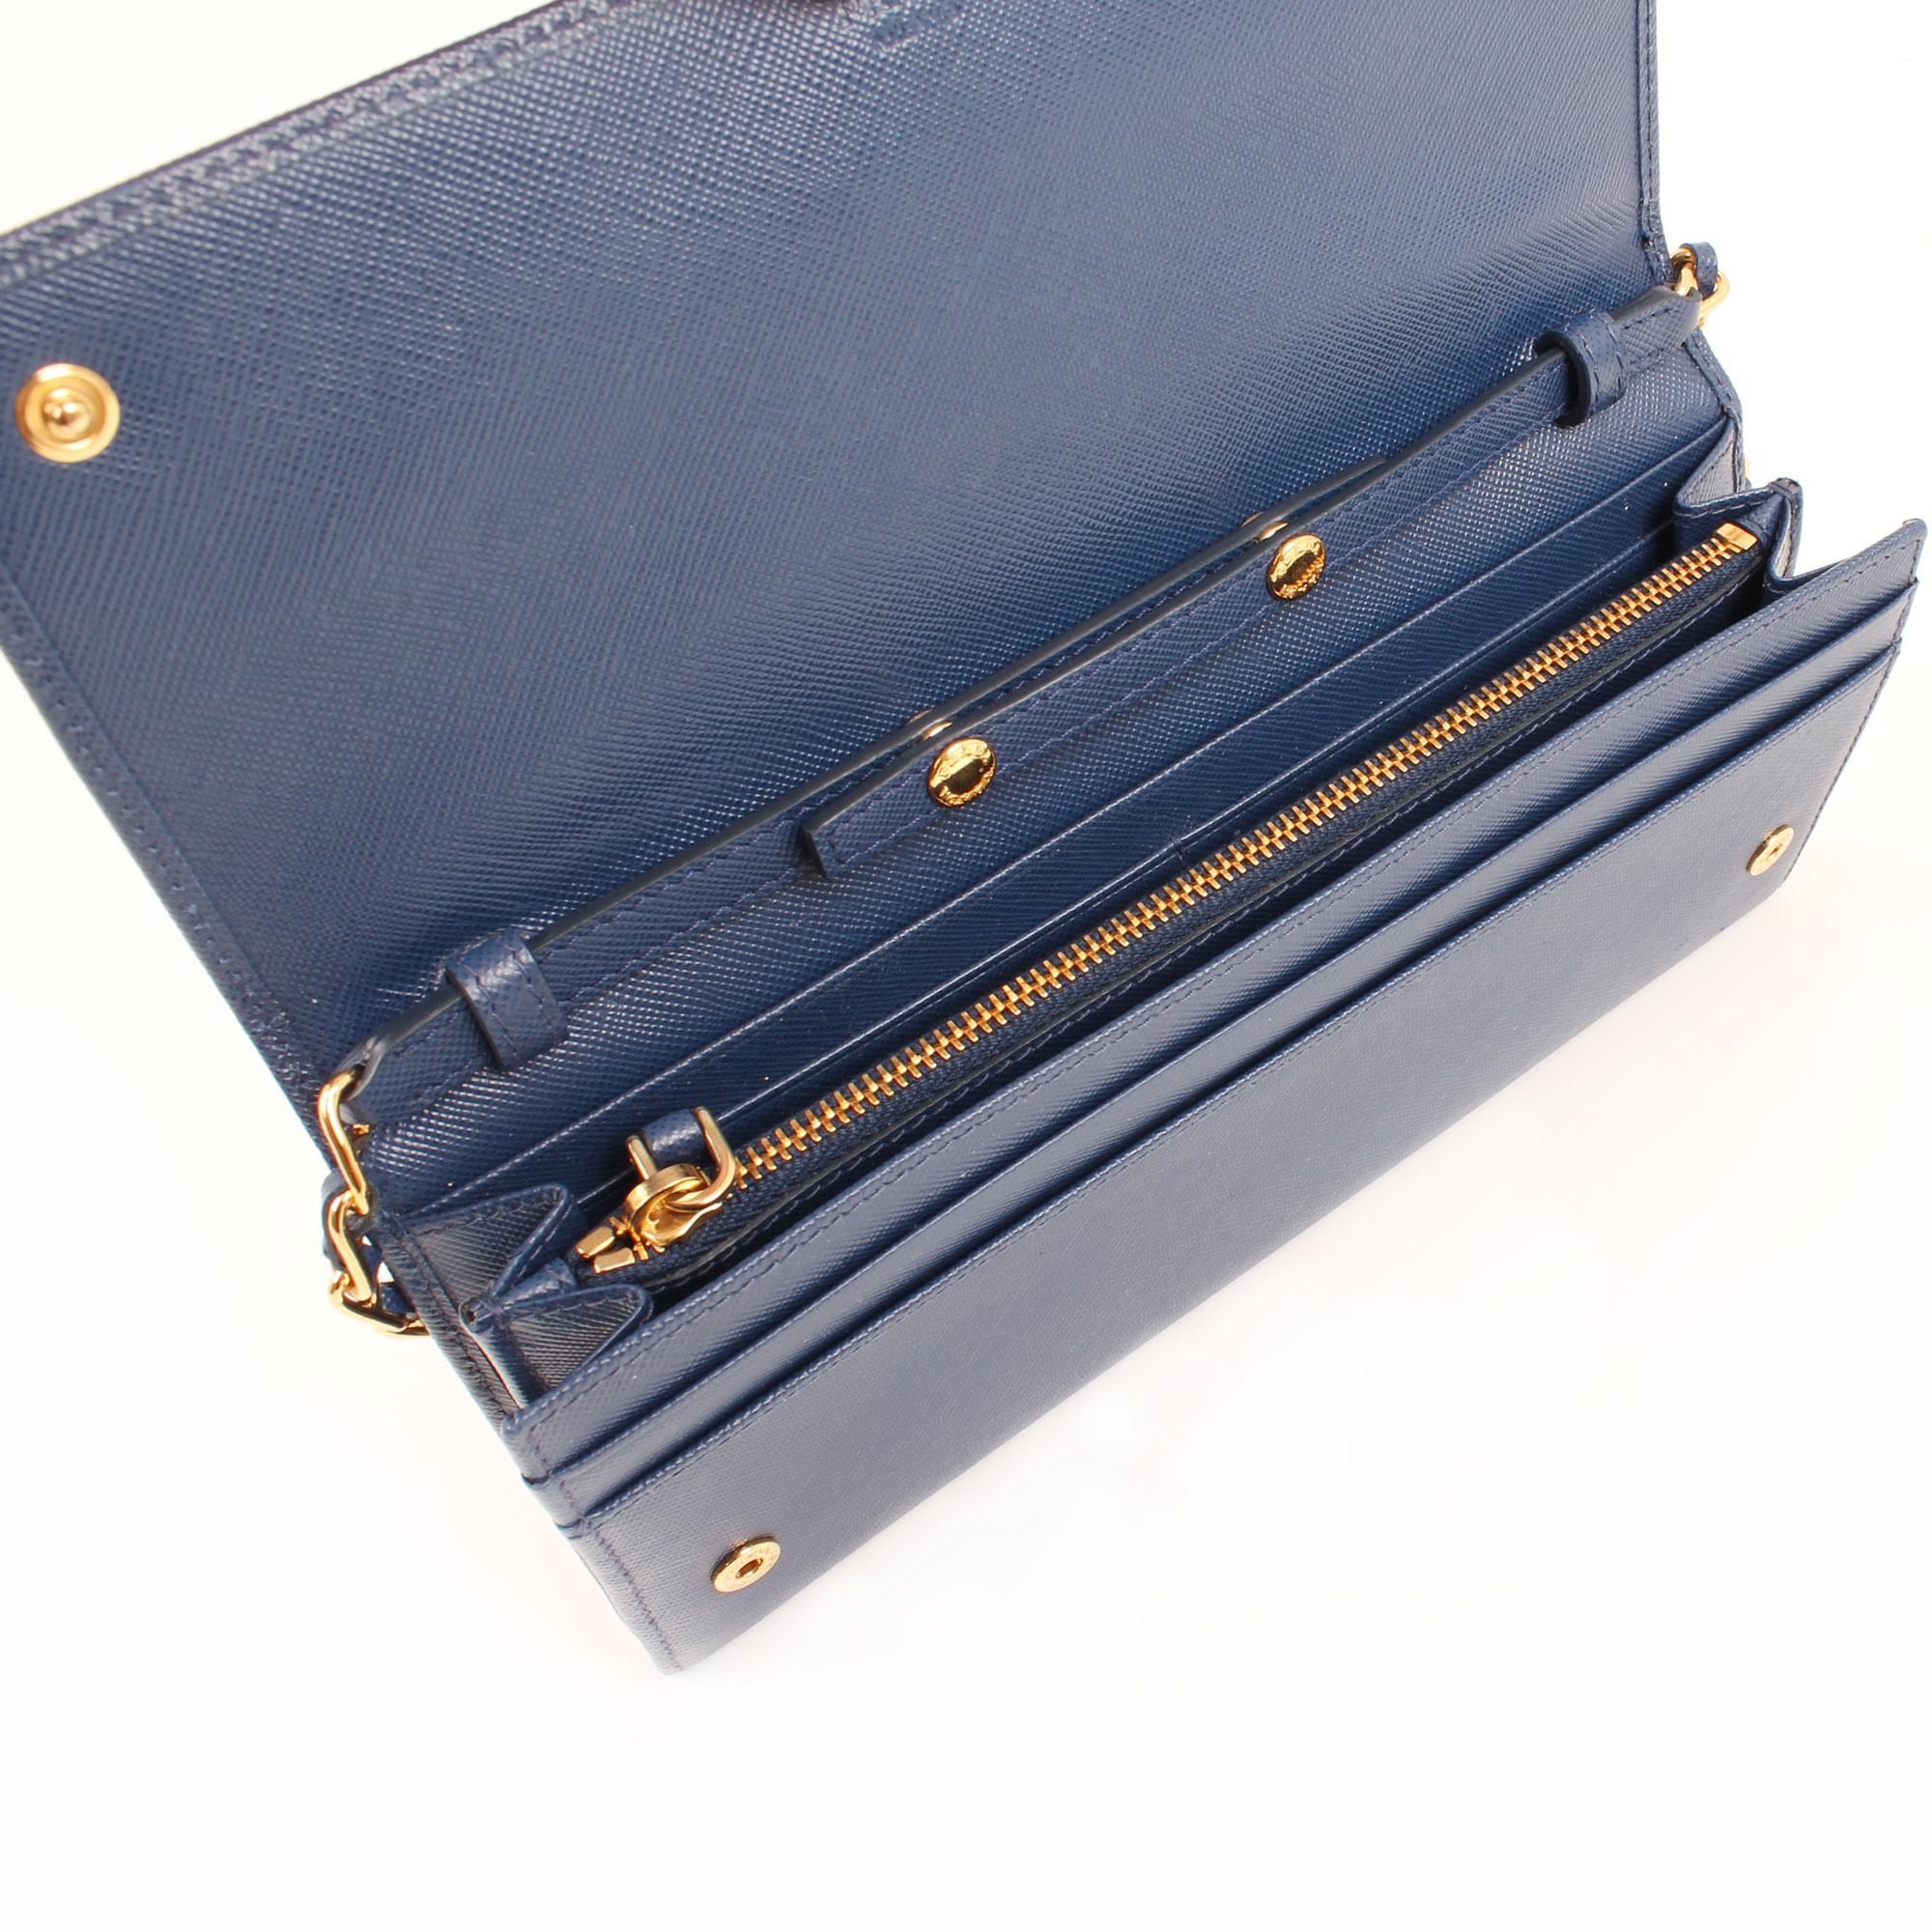 bag-prada-wallet-on-chain-saffiano-metal-bluette-blue-interior